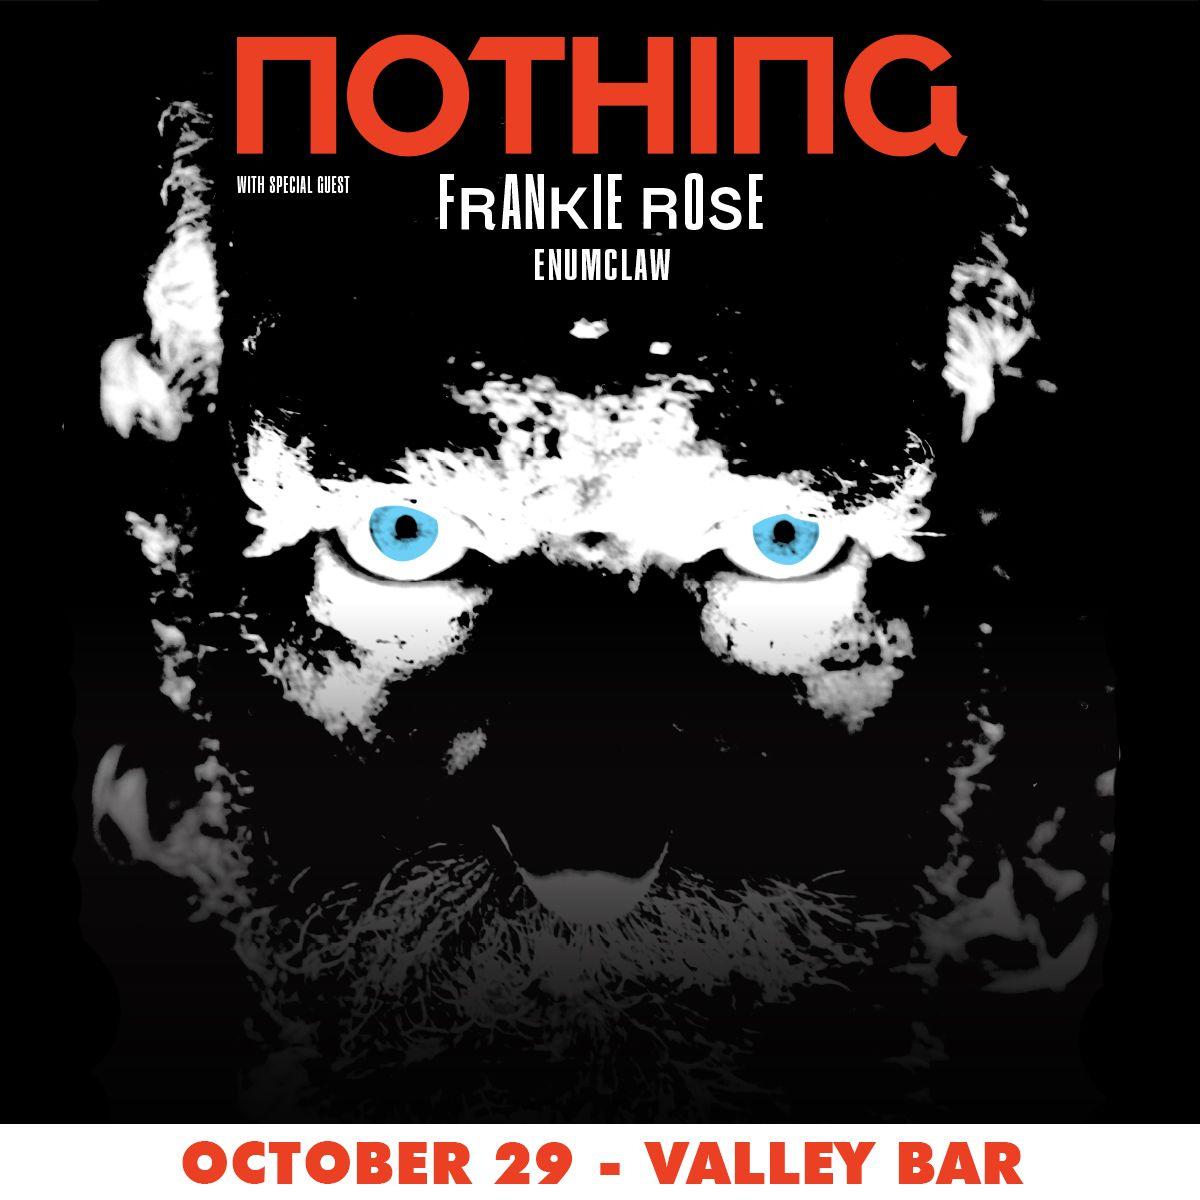 NOTHING: